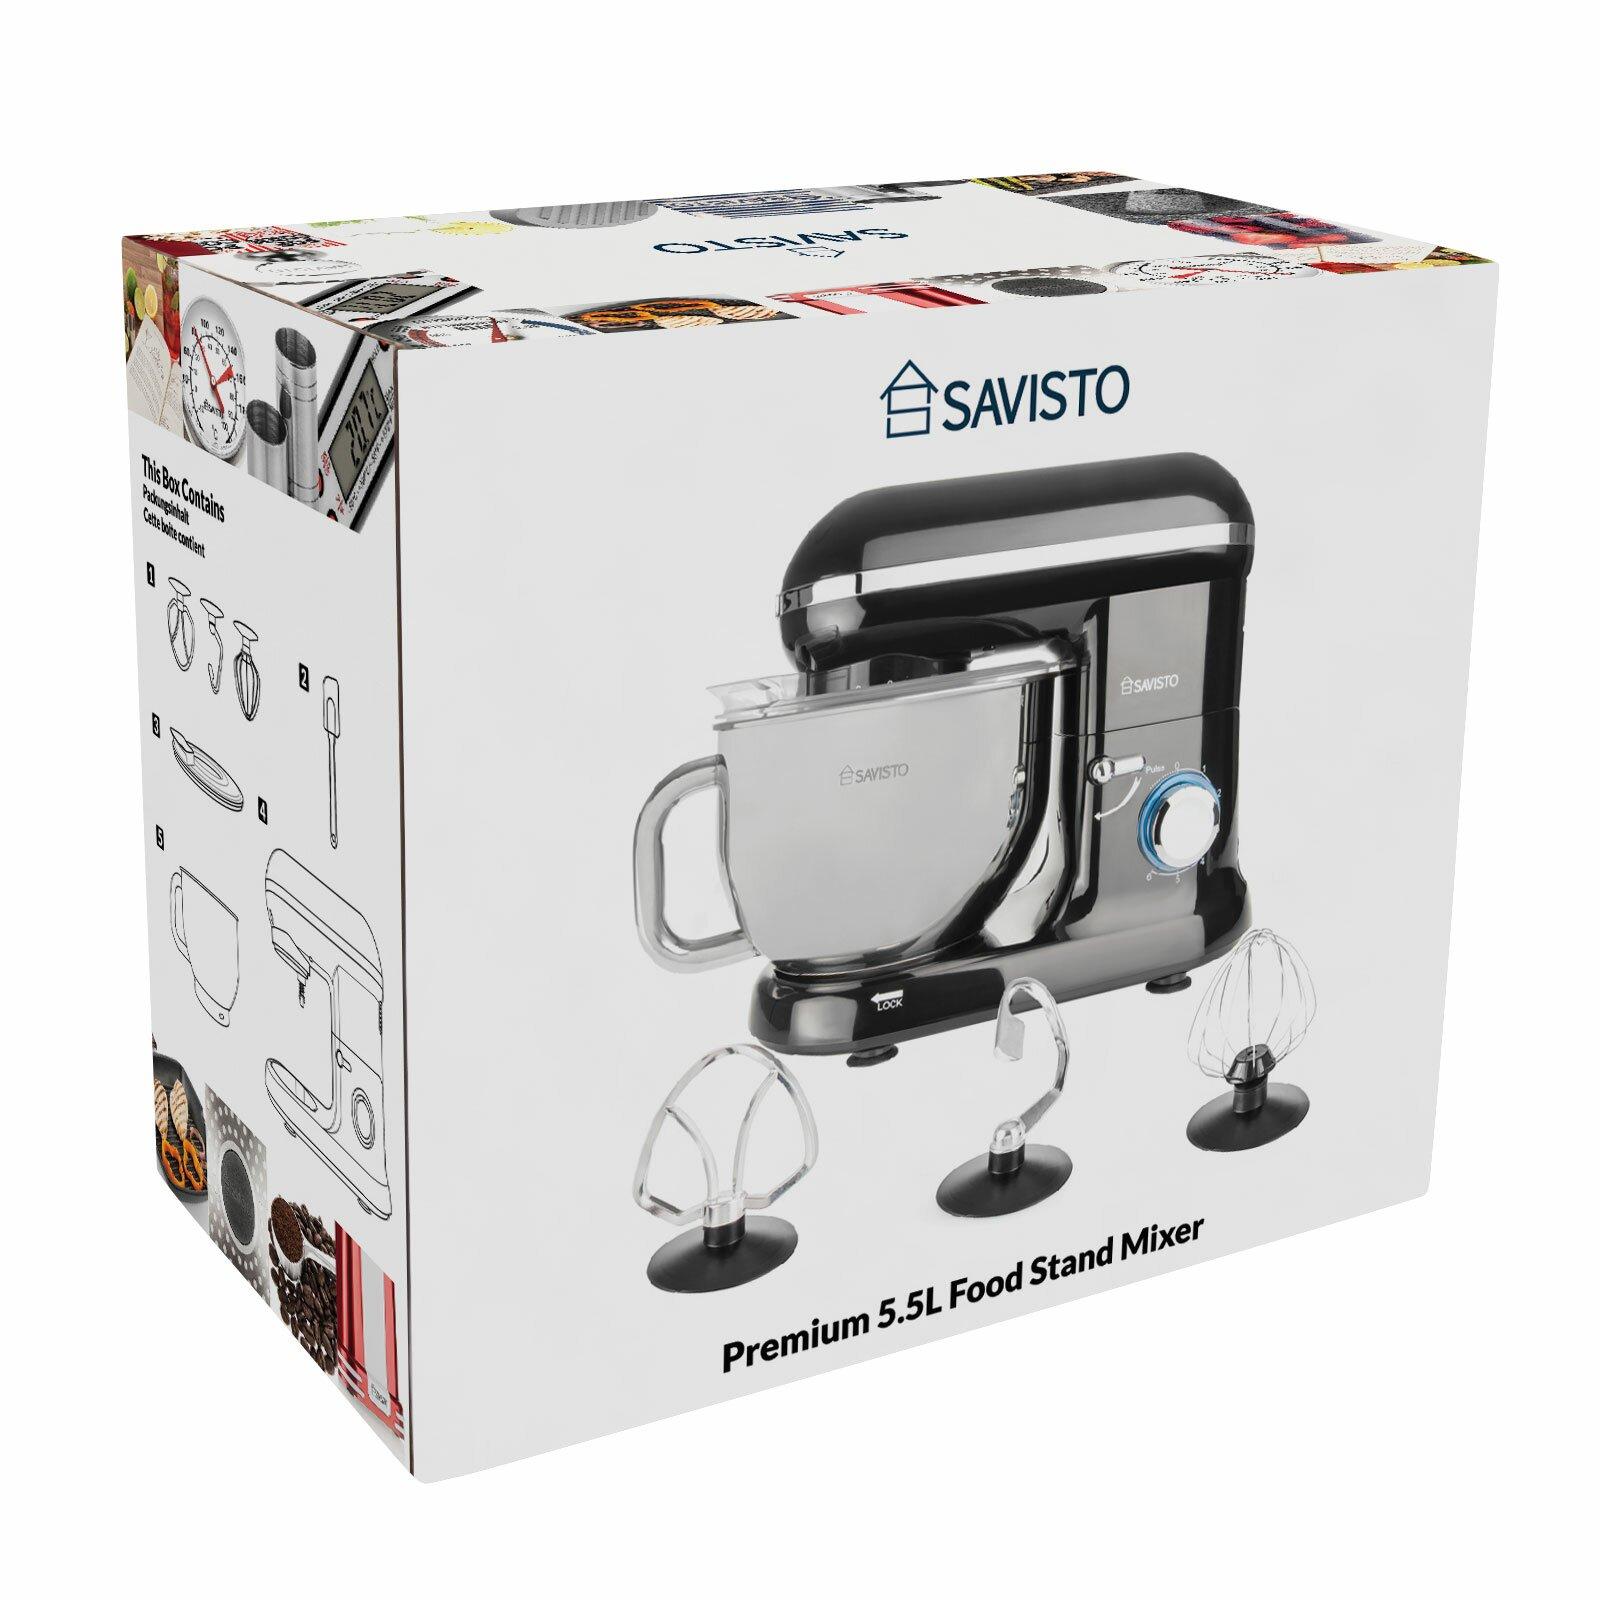 2 Piece Retro Kitchen Savisto 1260w 2 Piece Retro Food Stand Mixer Set Reviews